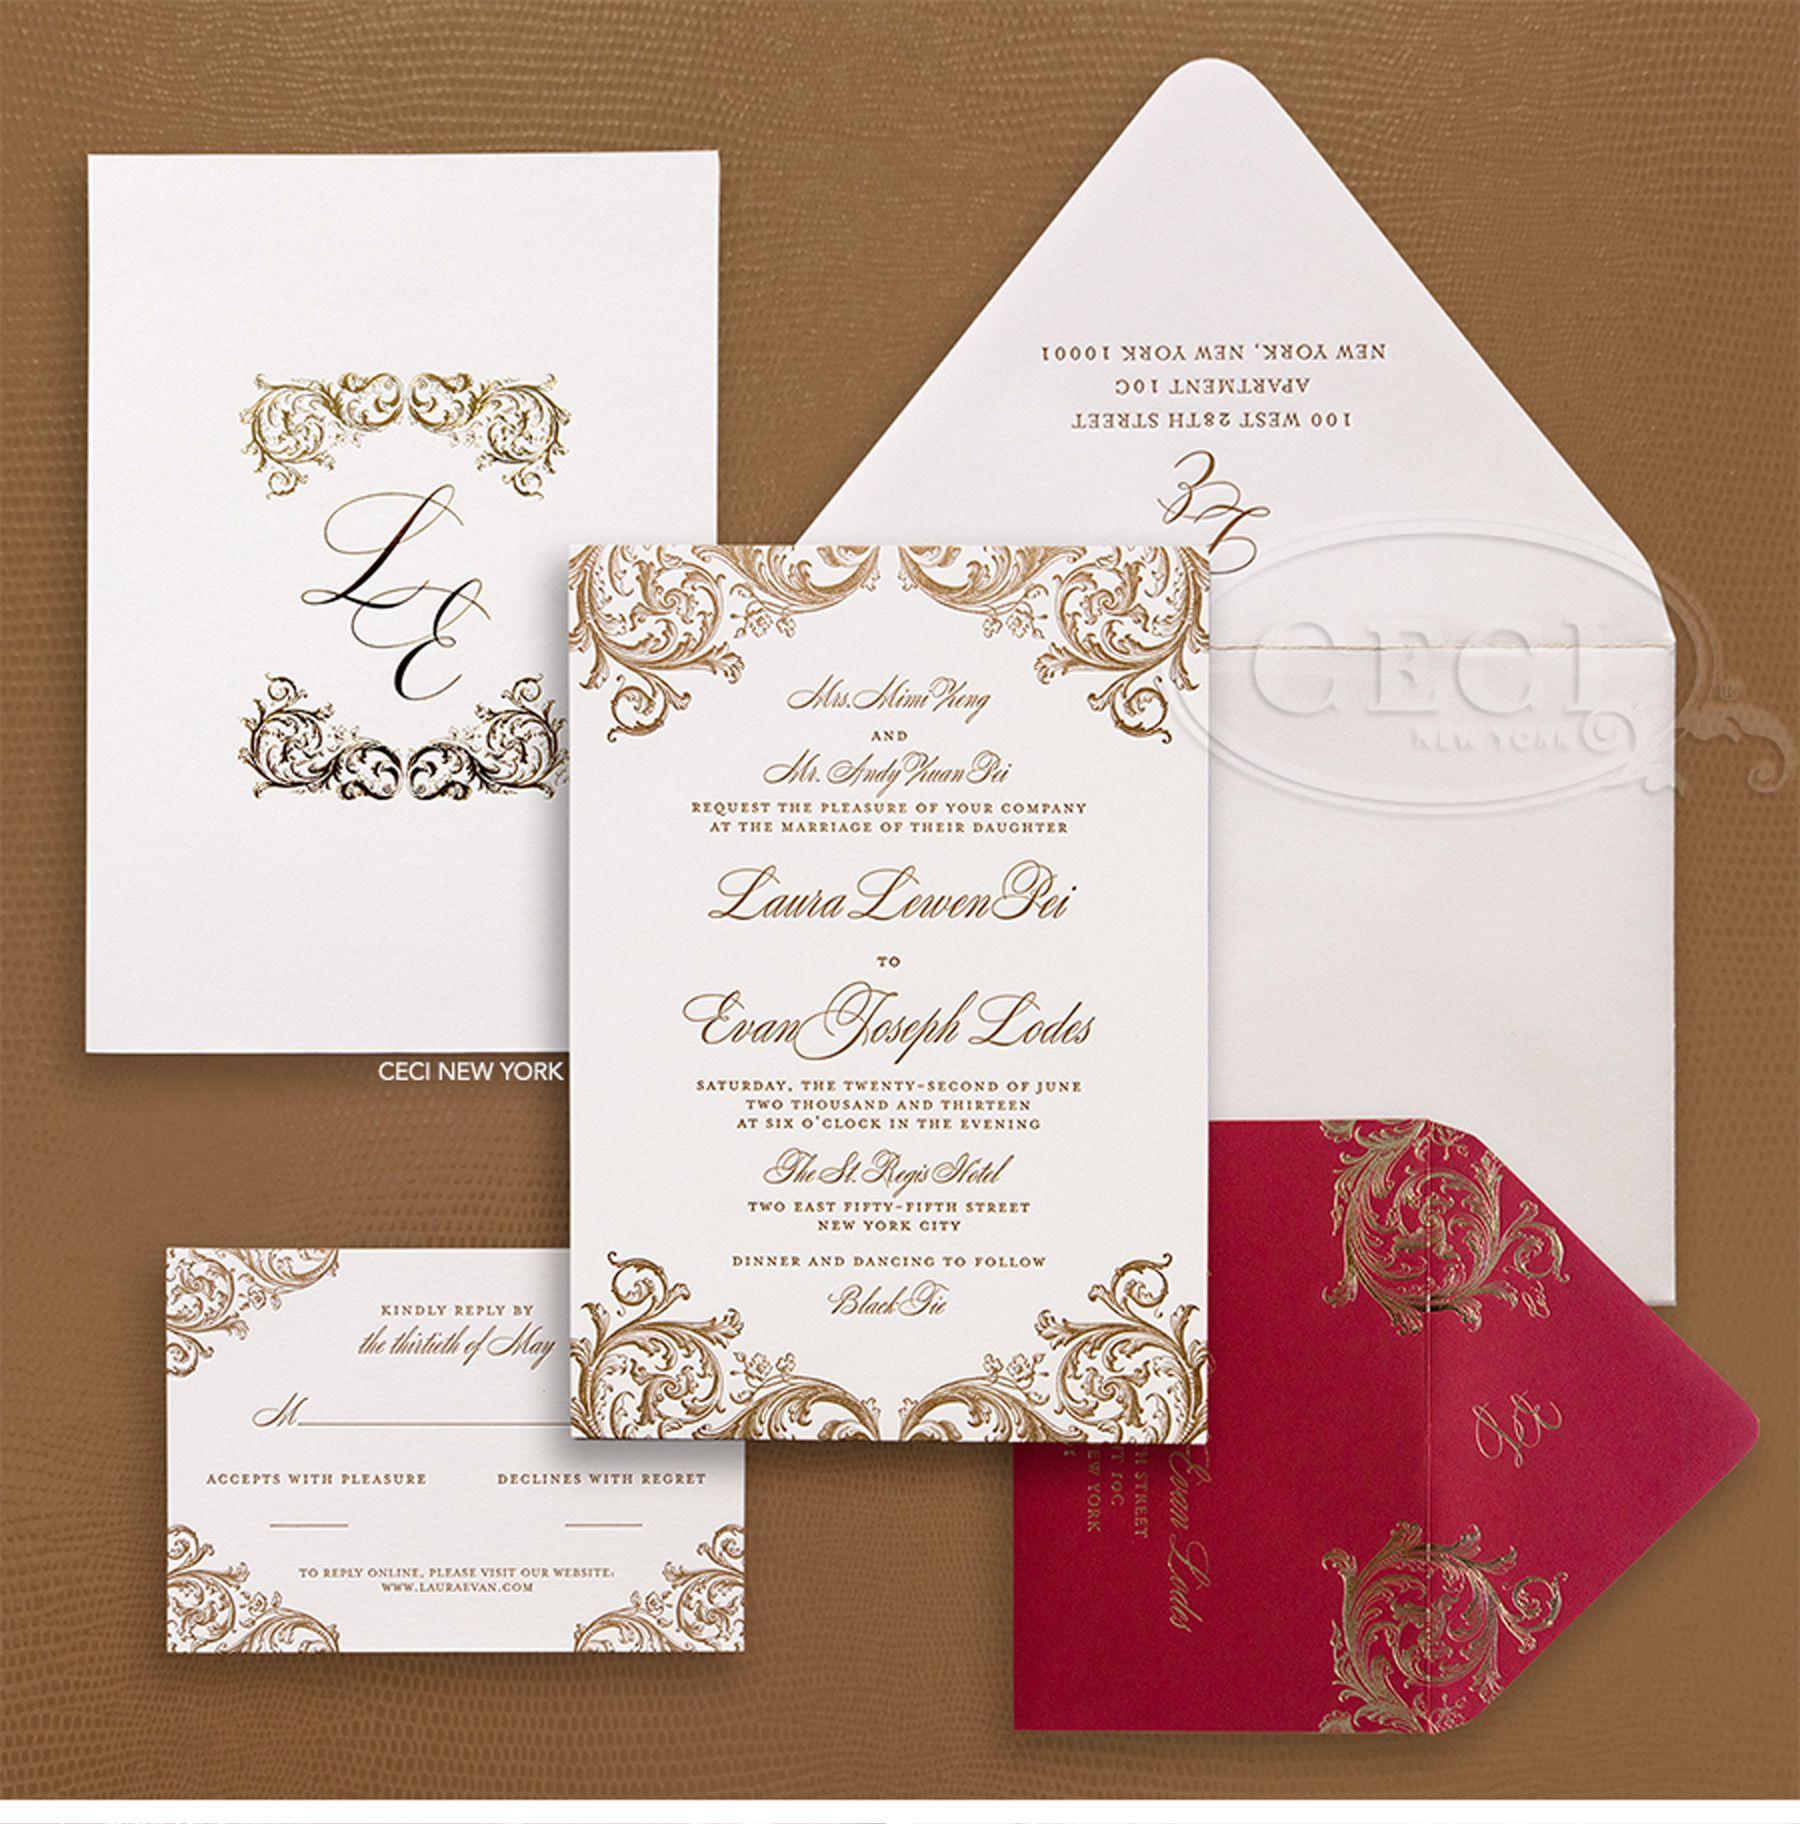 Luxury Wedding Invitations By Ceci New York: St Regis New York Wedding